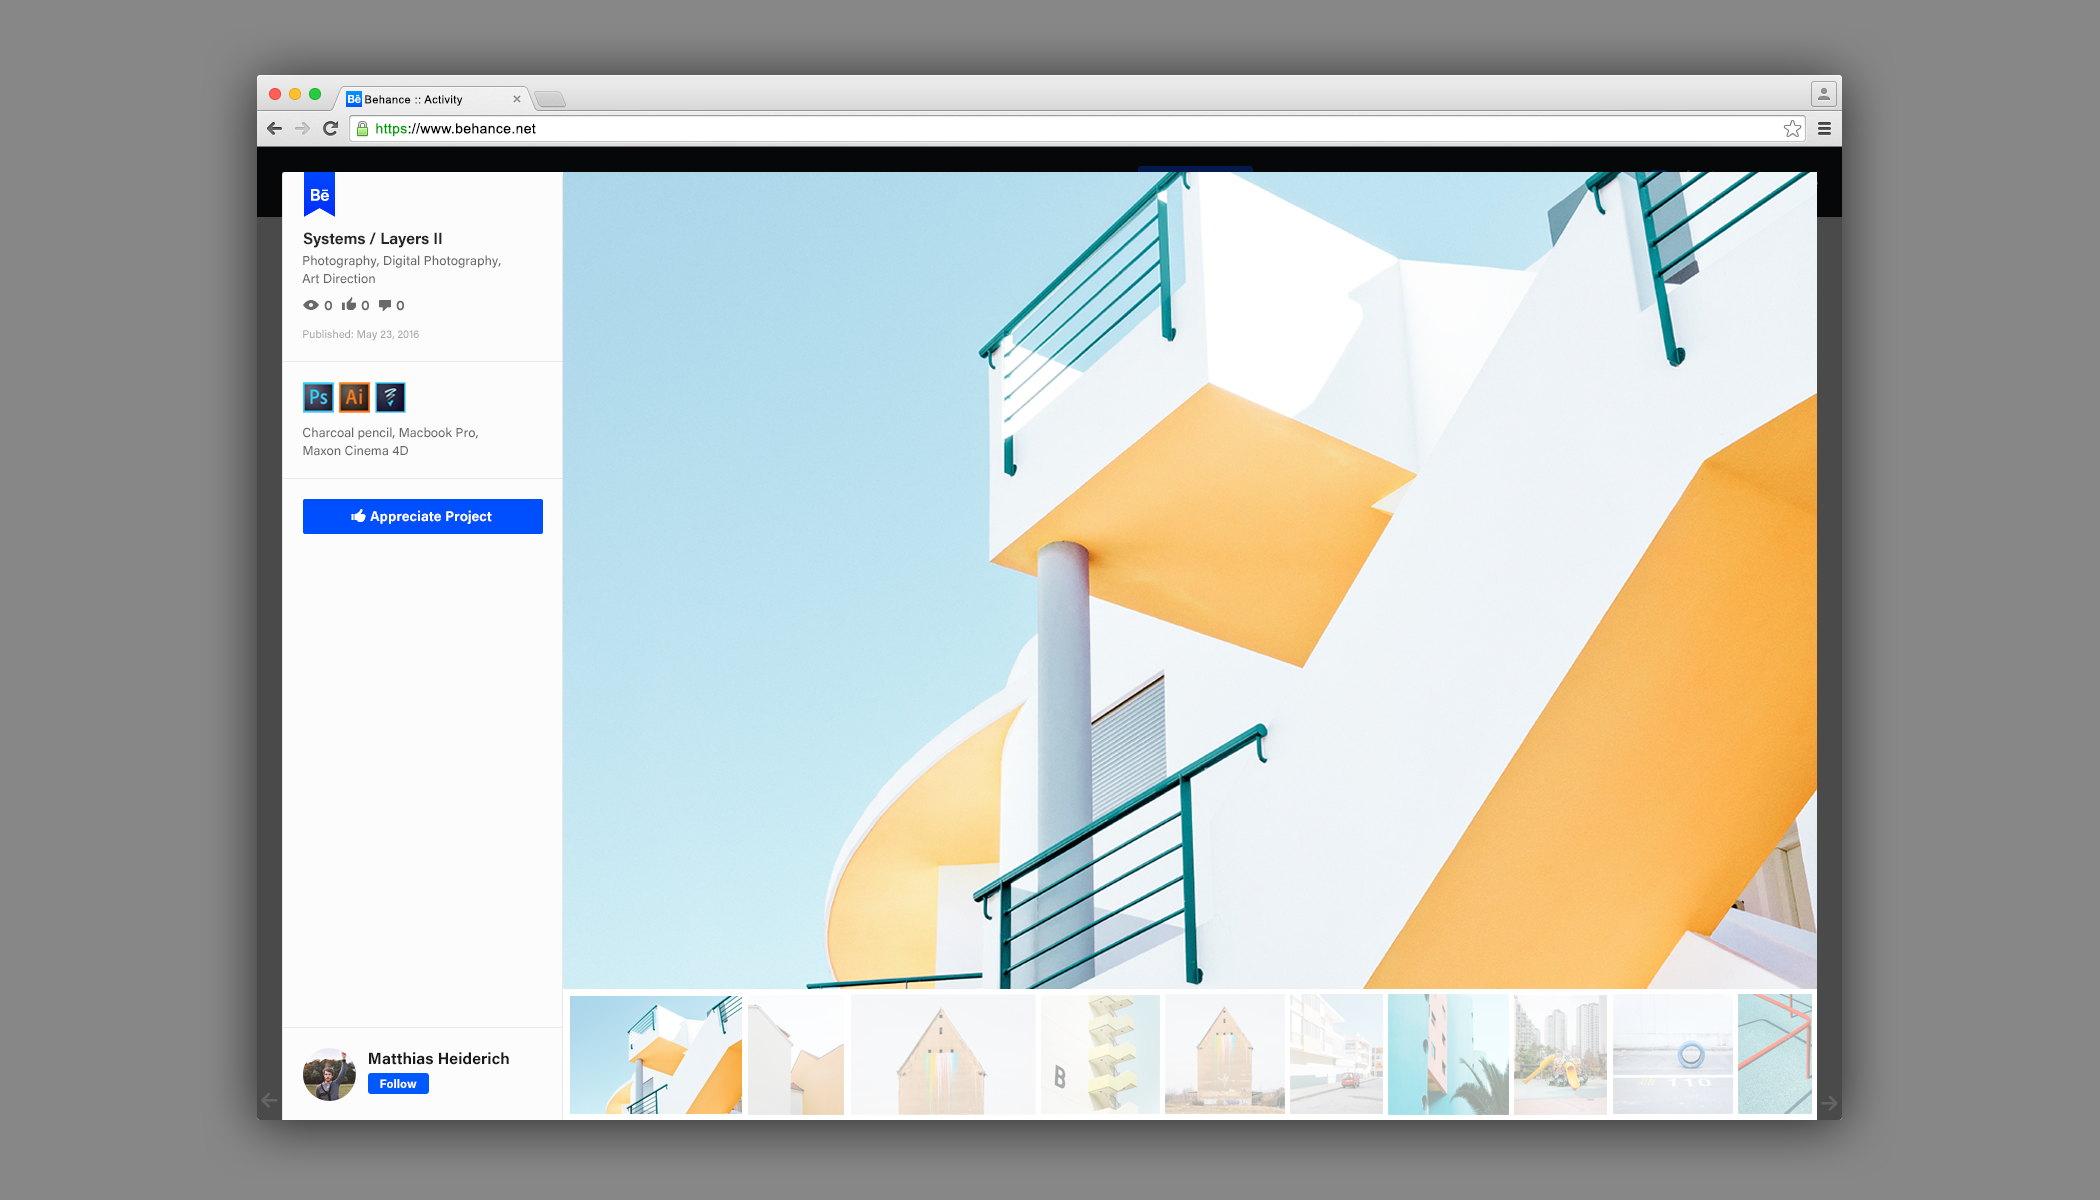 Net5_Project_View-Exploration_Jeannie_0000_Left-Bar----Slideshow---regular-browser.png